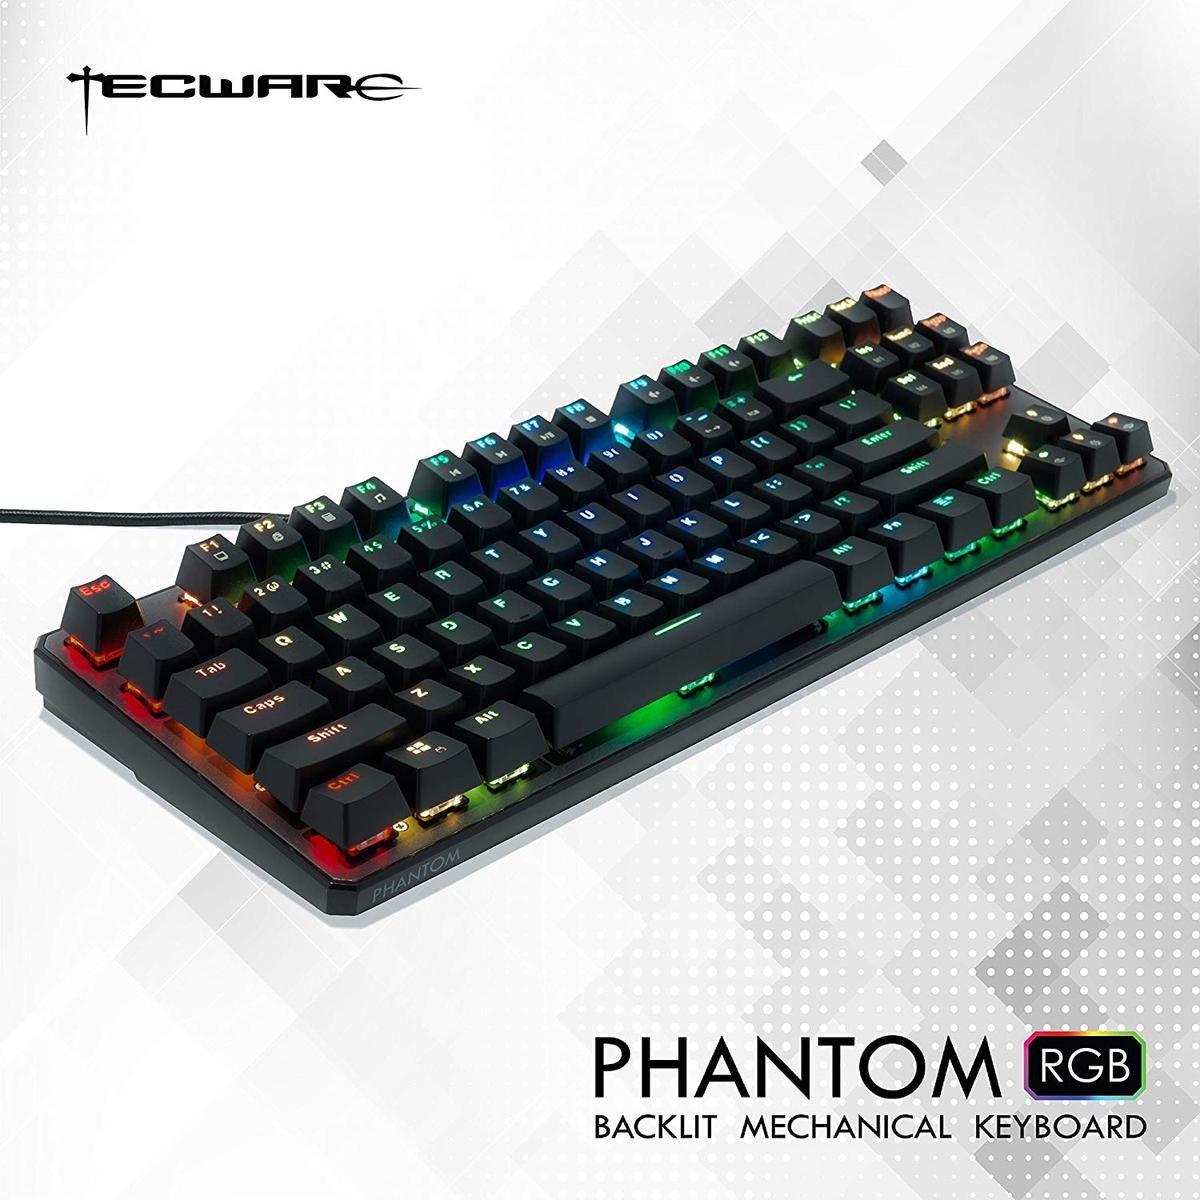 Tecware Phantom RGB Wired Gaming Keyboard